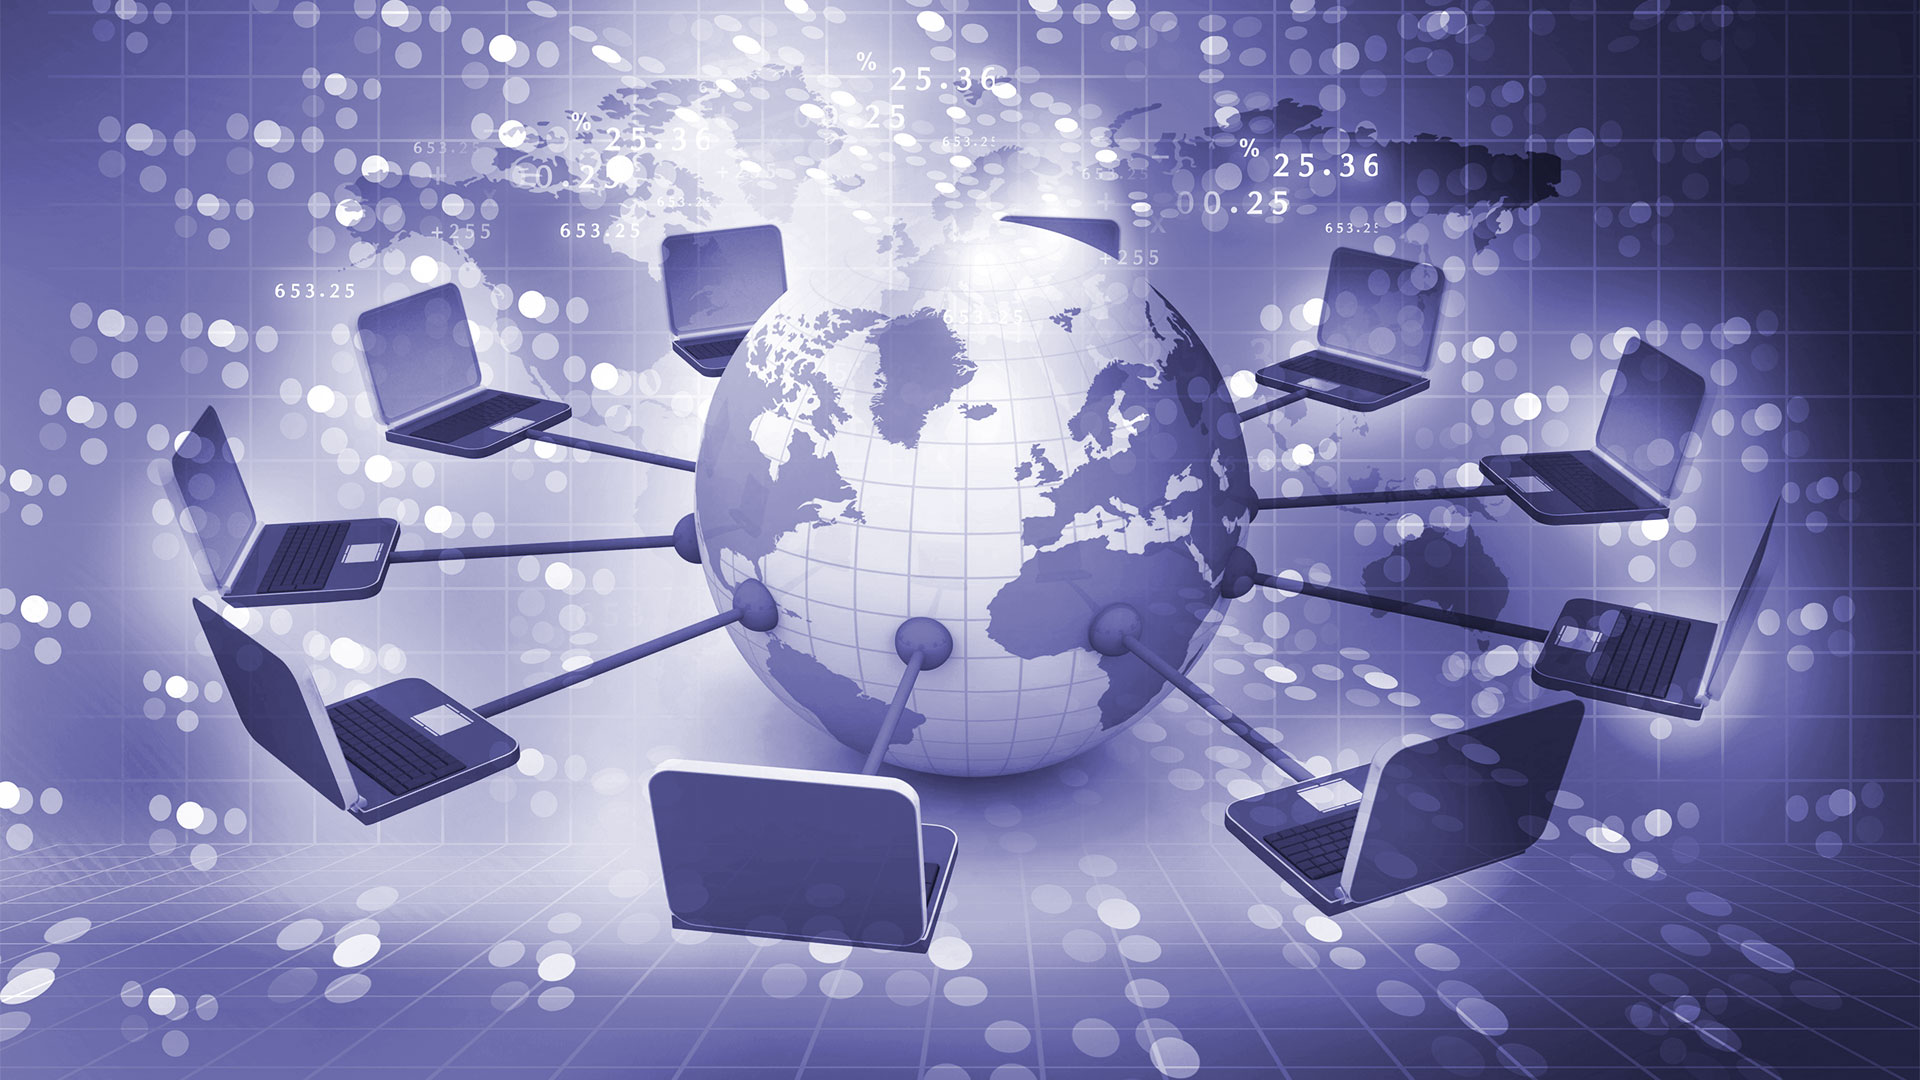 recursos de rede do servidor dedicado